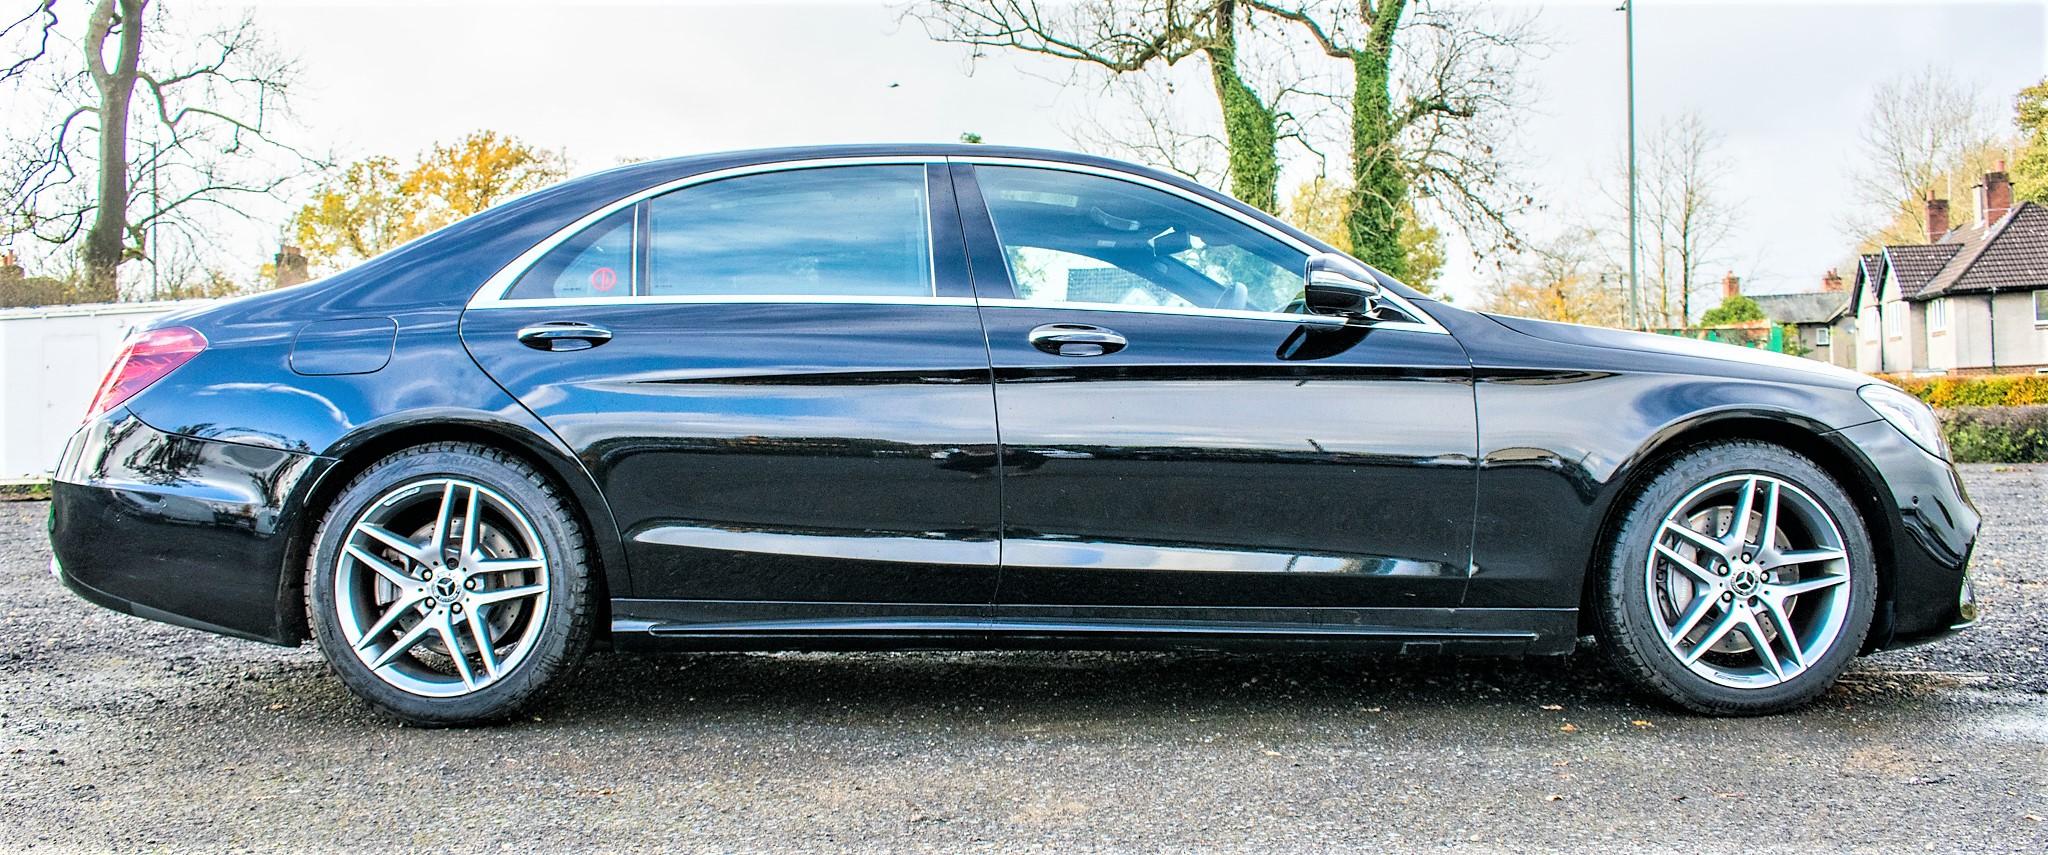 Mercedes Benz S450 L AMG Line Executive auto petrol 4 door saloon car Registration Number: FX68 - Image 7 of 30